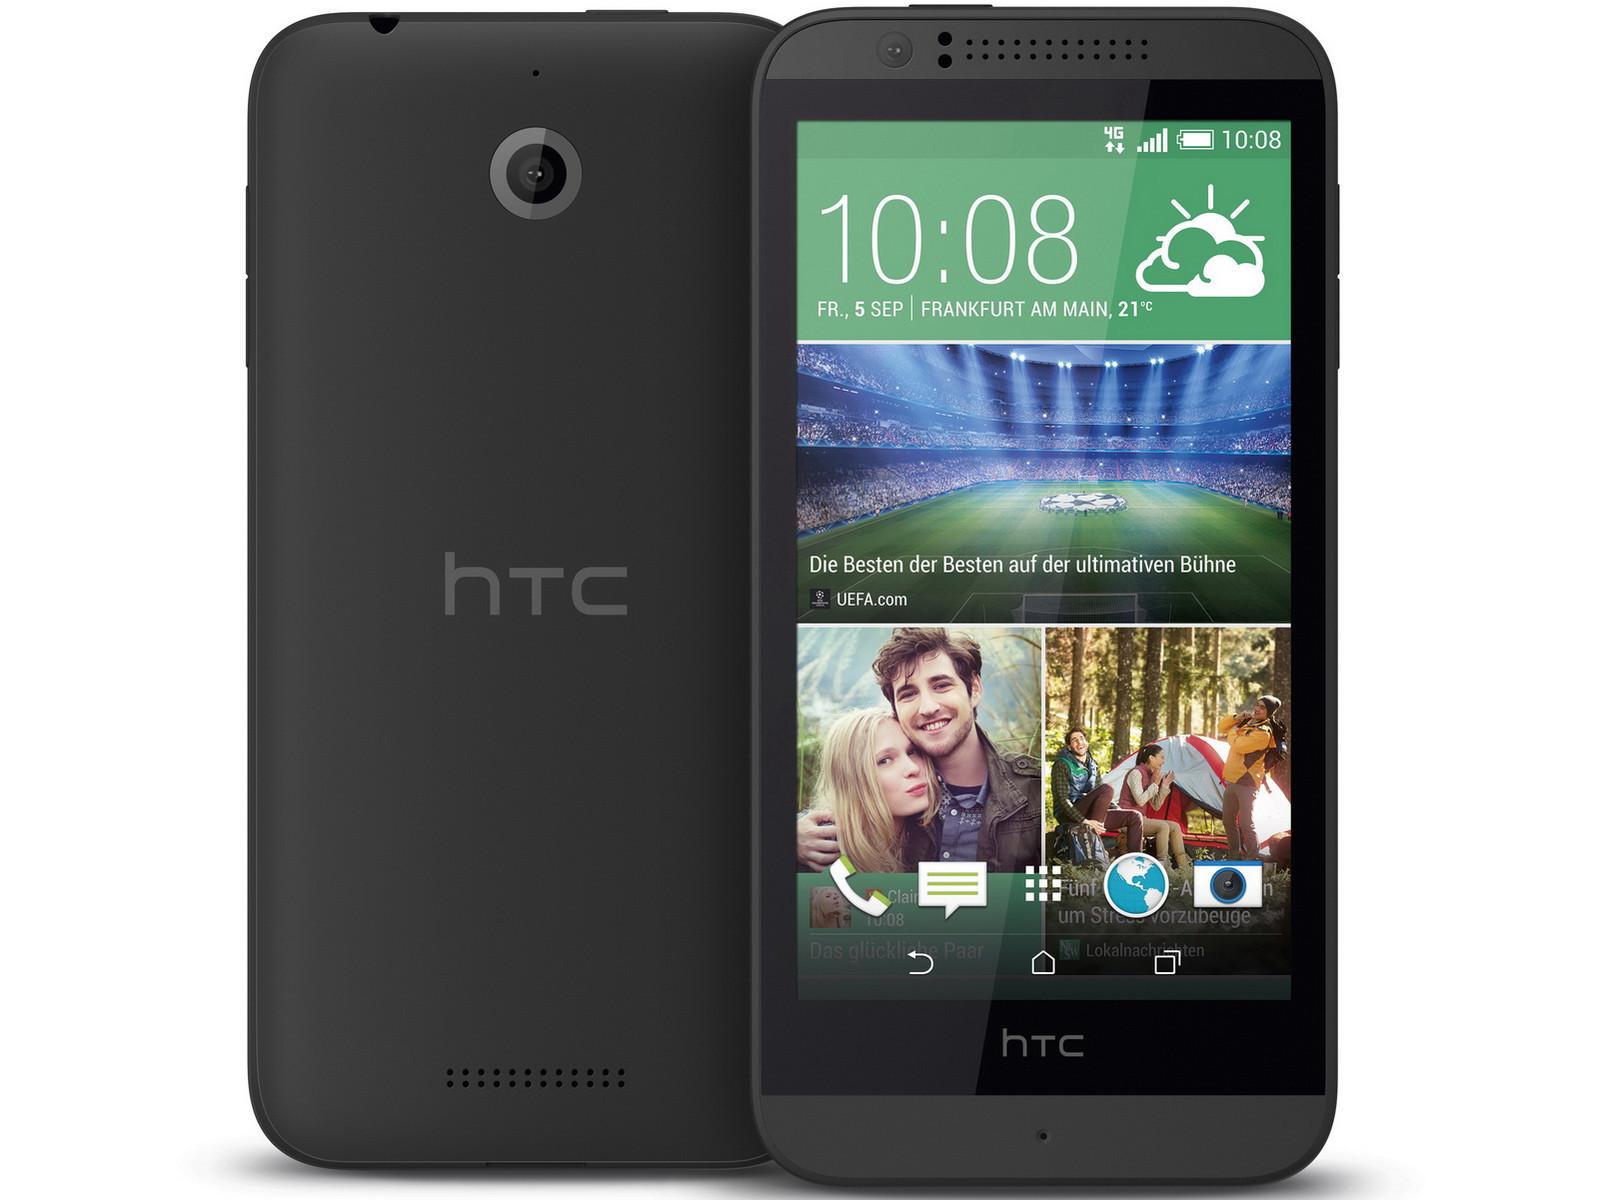 htc desire 510 4 7 zoll smartphone mit lte f r 200 euro. Black Bedroom Furniture Sets. Home Design Ideas